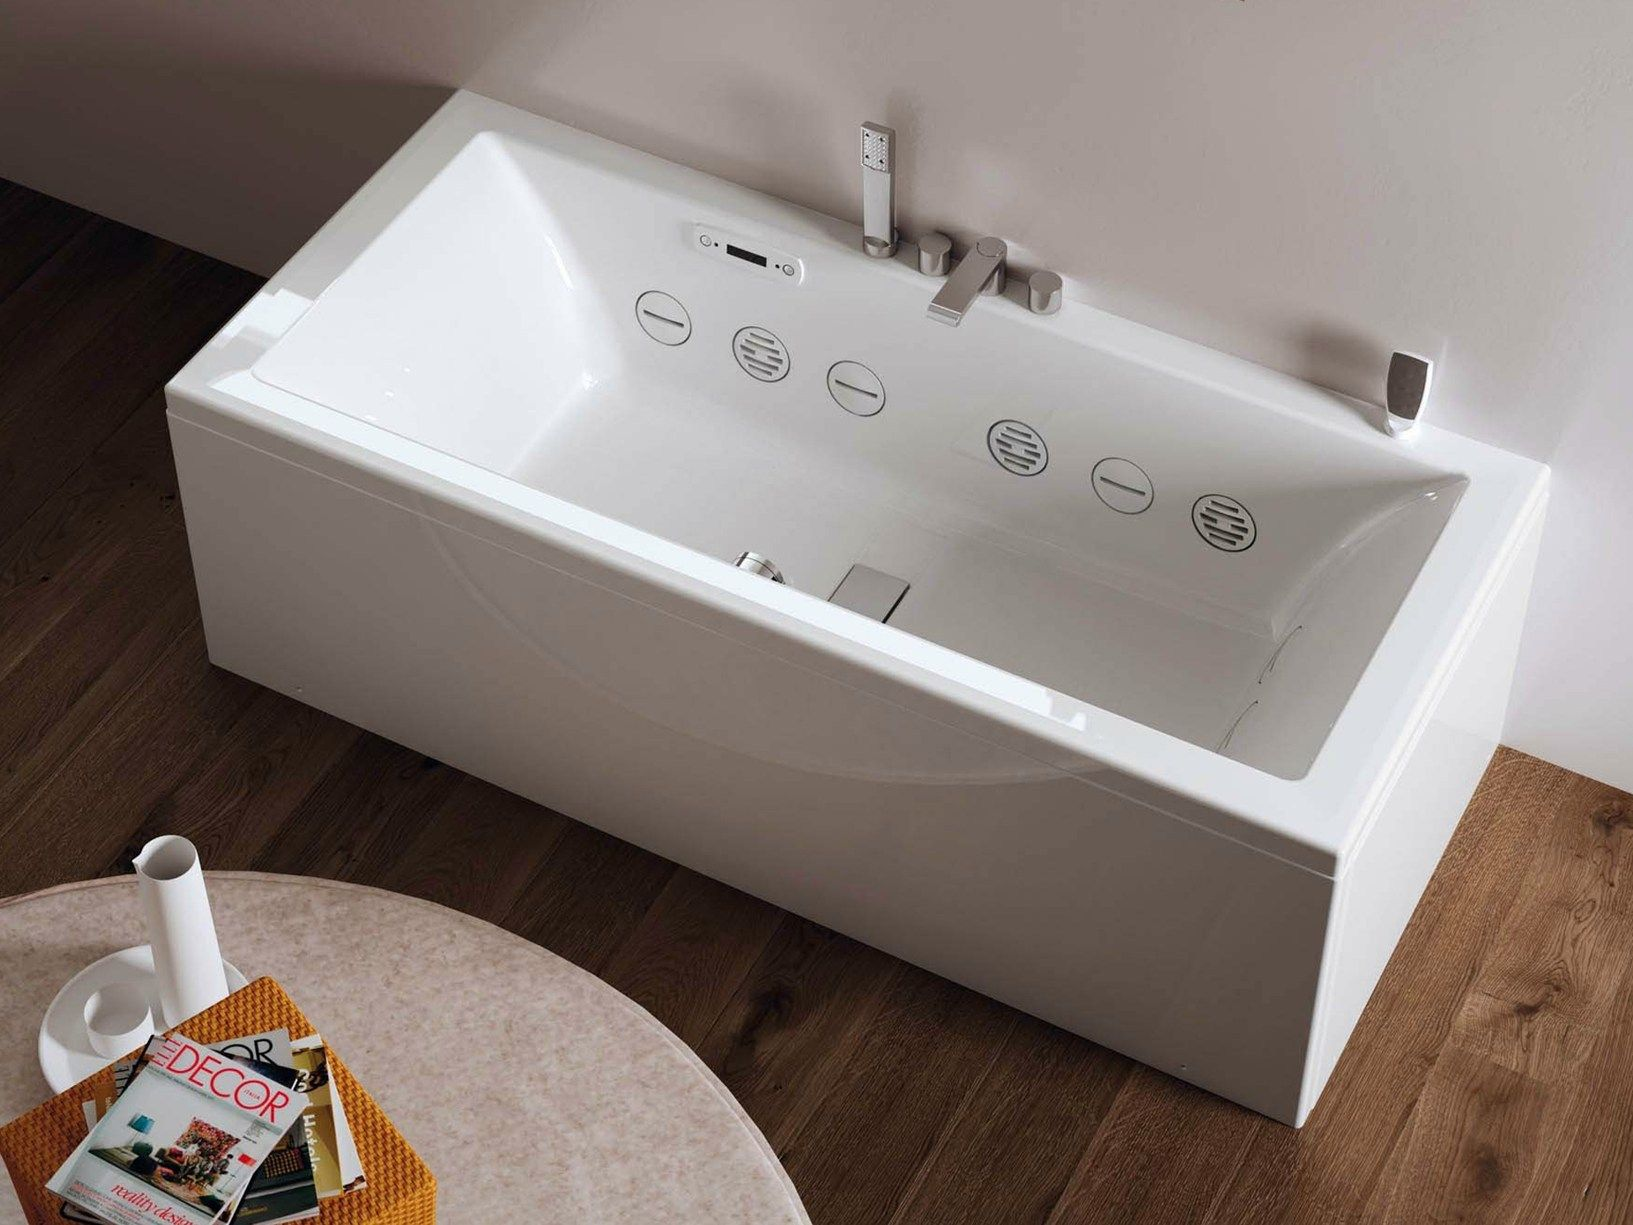 Vasche Da Bagno Teuco Angolari : Outlet vasche idromassaggio teuco vasca angolare cm